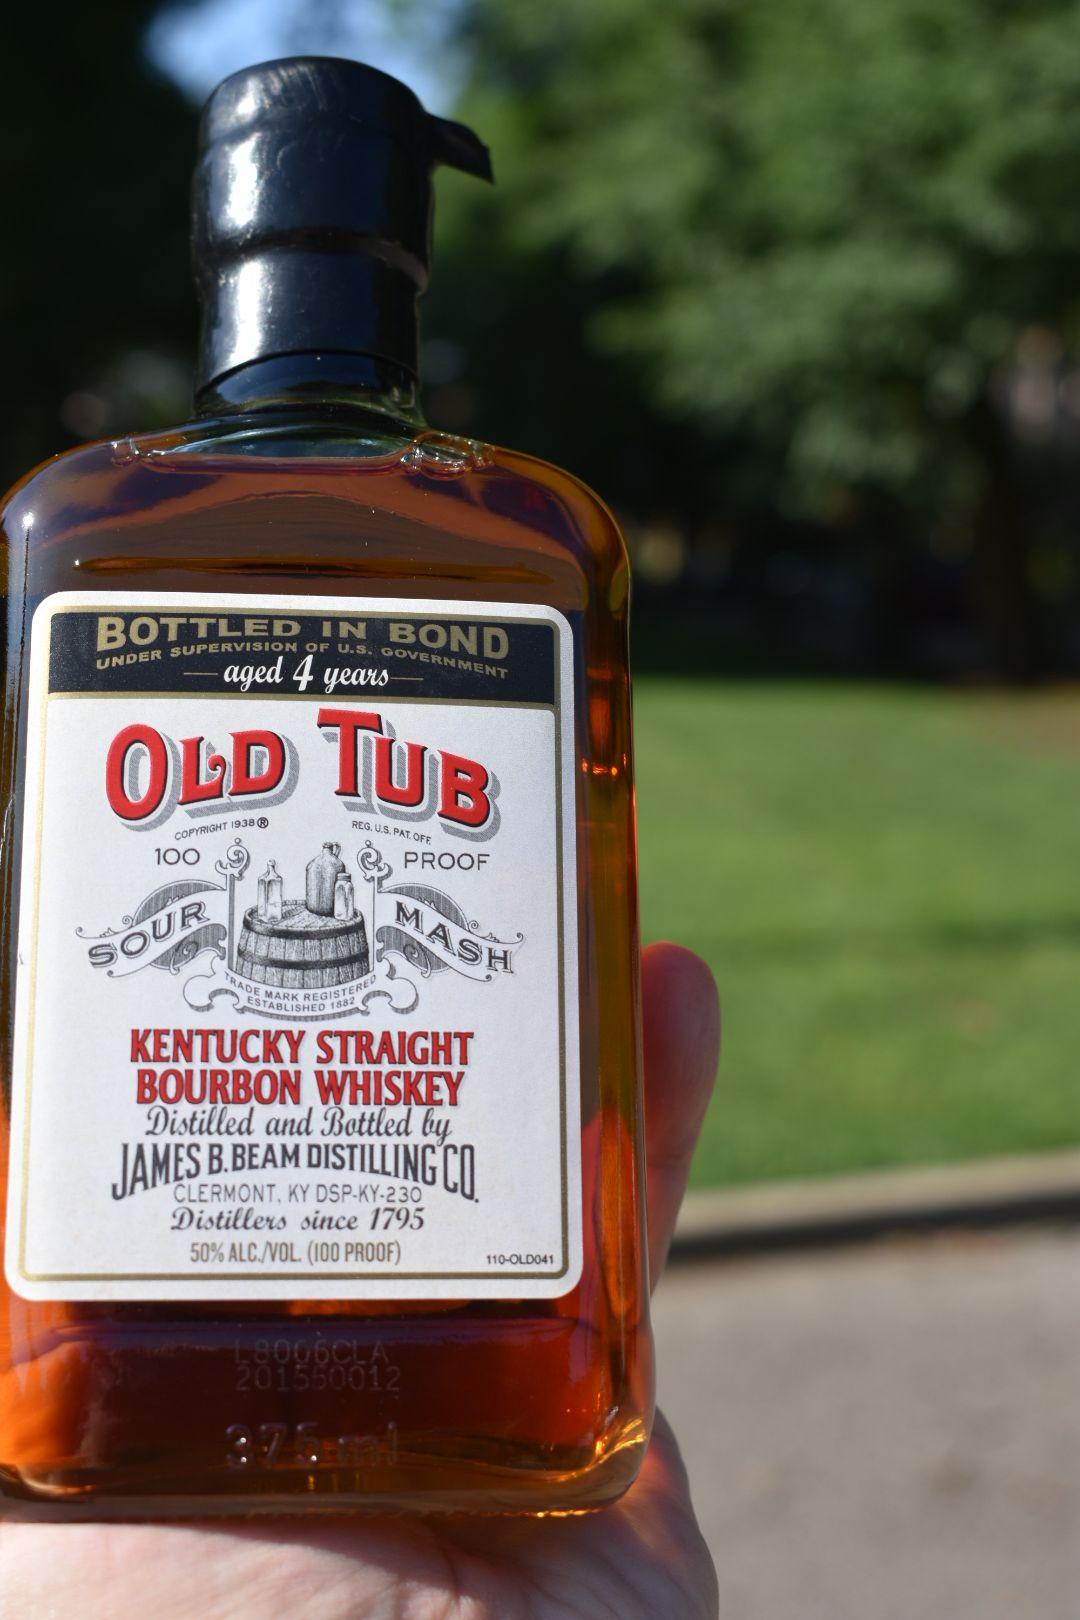 Best Rum Under 100 And Top Rated Rum Brands In 2019 Rum